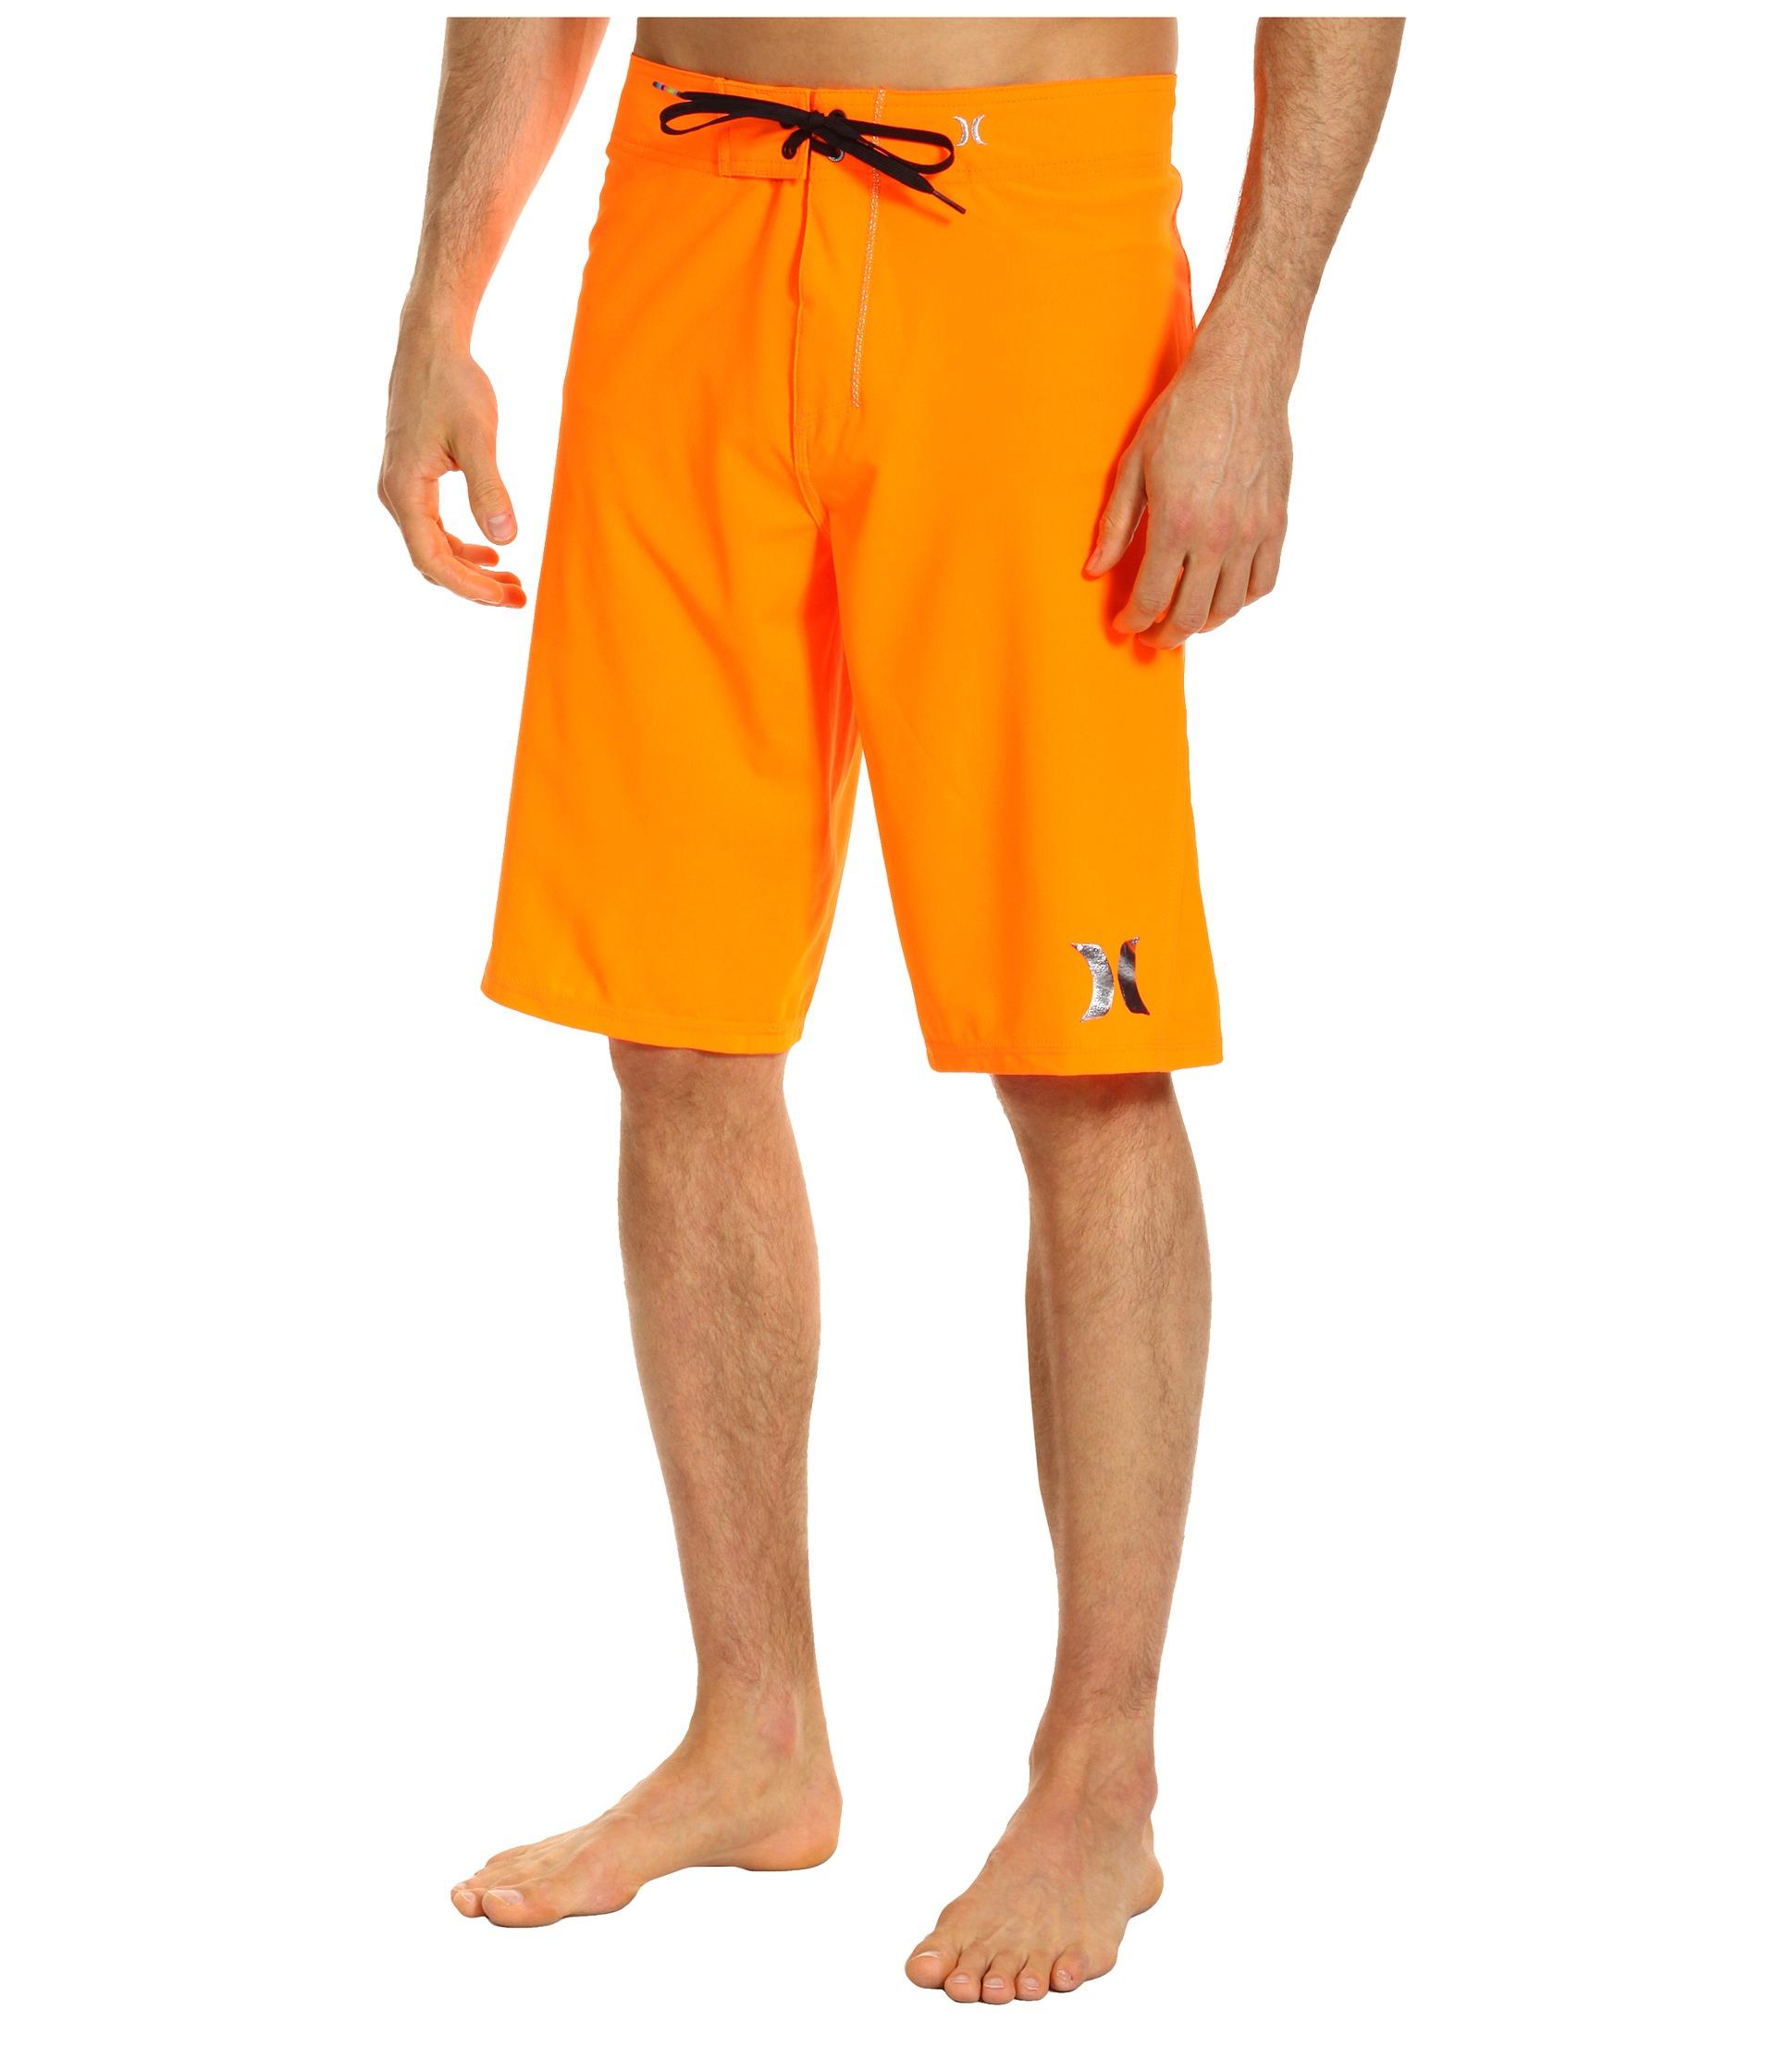 Buy Cheap Hurley Phantom Solid Boardshort Neon Orange